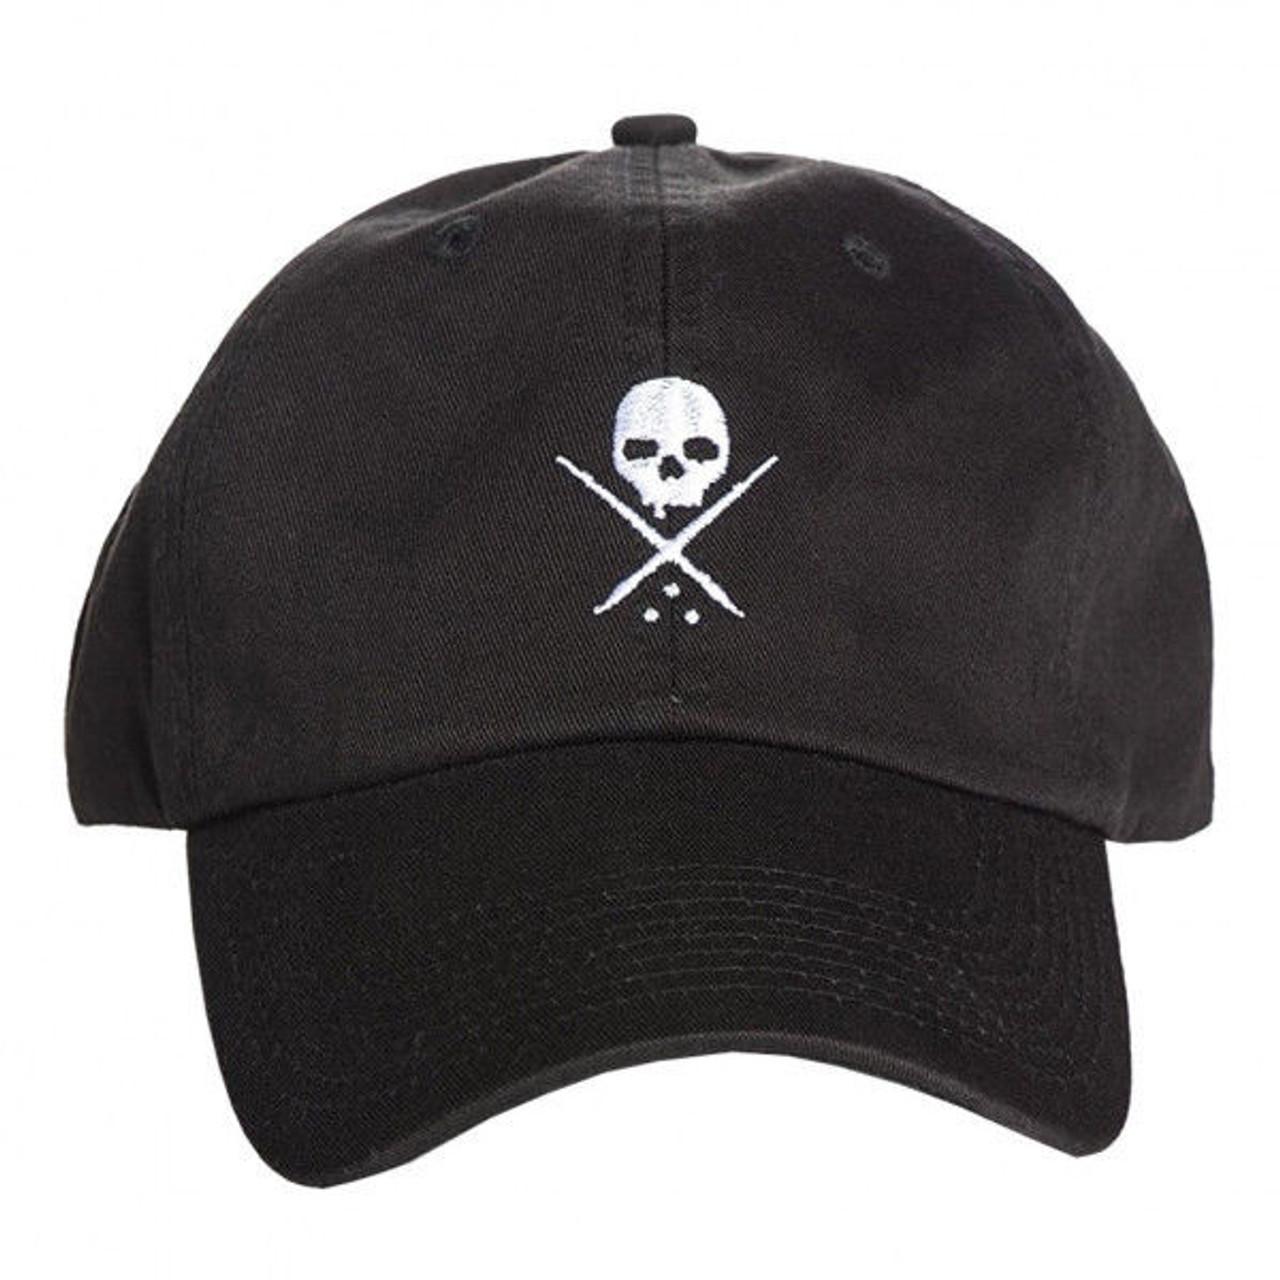 e9718a76592 Sullen Clothing Men s Pop Badge Skull Logo Dad Hat Strapback Embroidered  Cap - Fearless Apparel